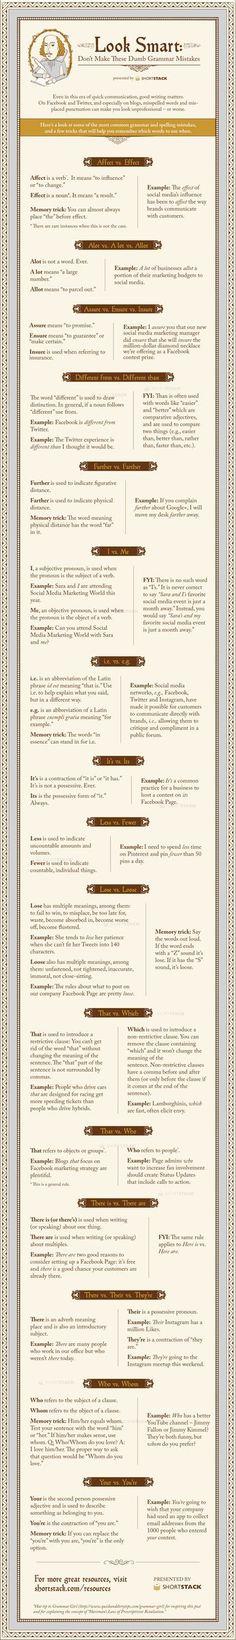 grammar-mistakes.jpg (900×6258)